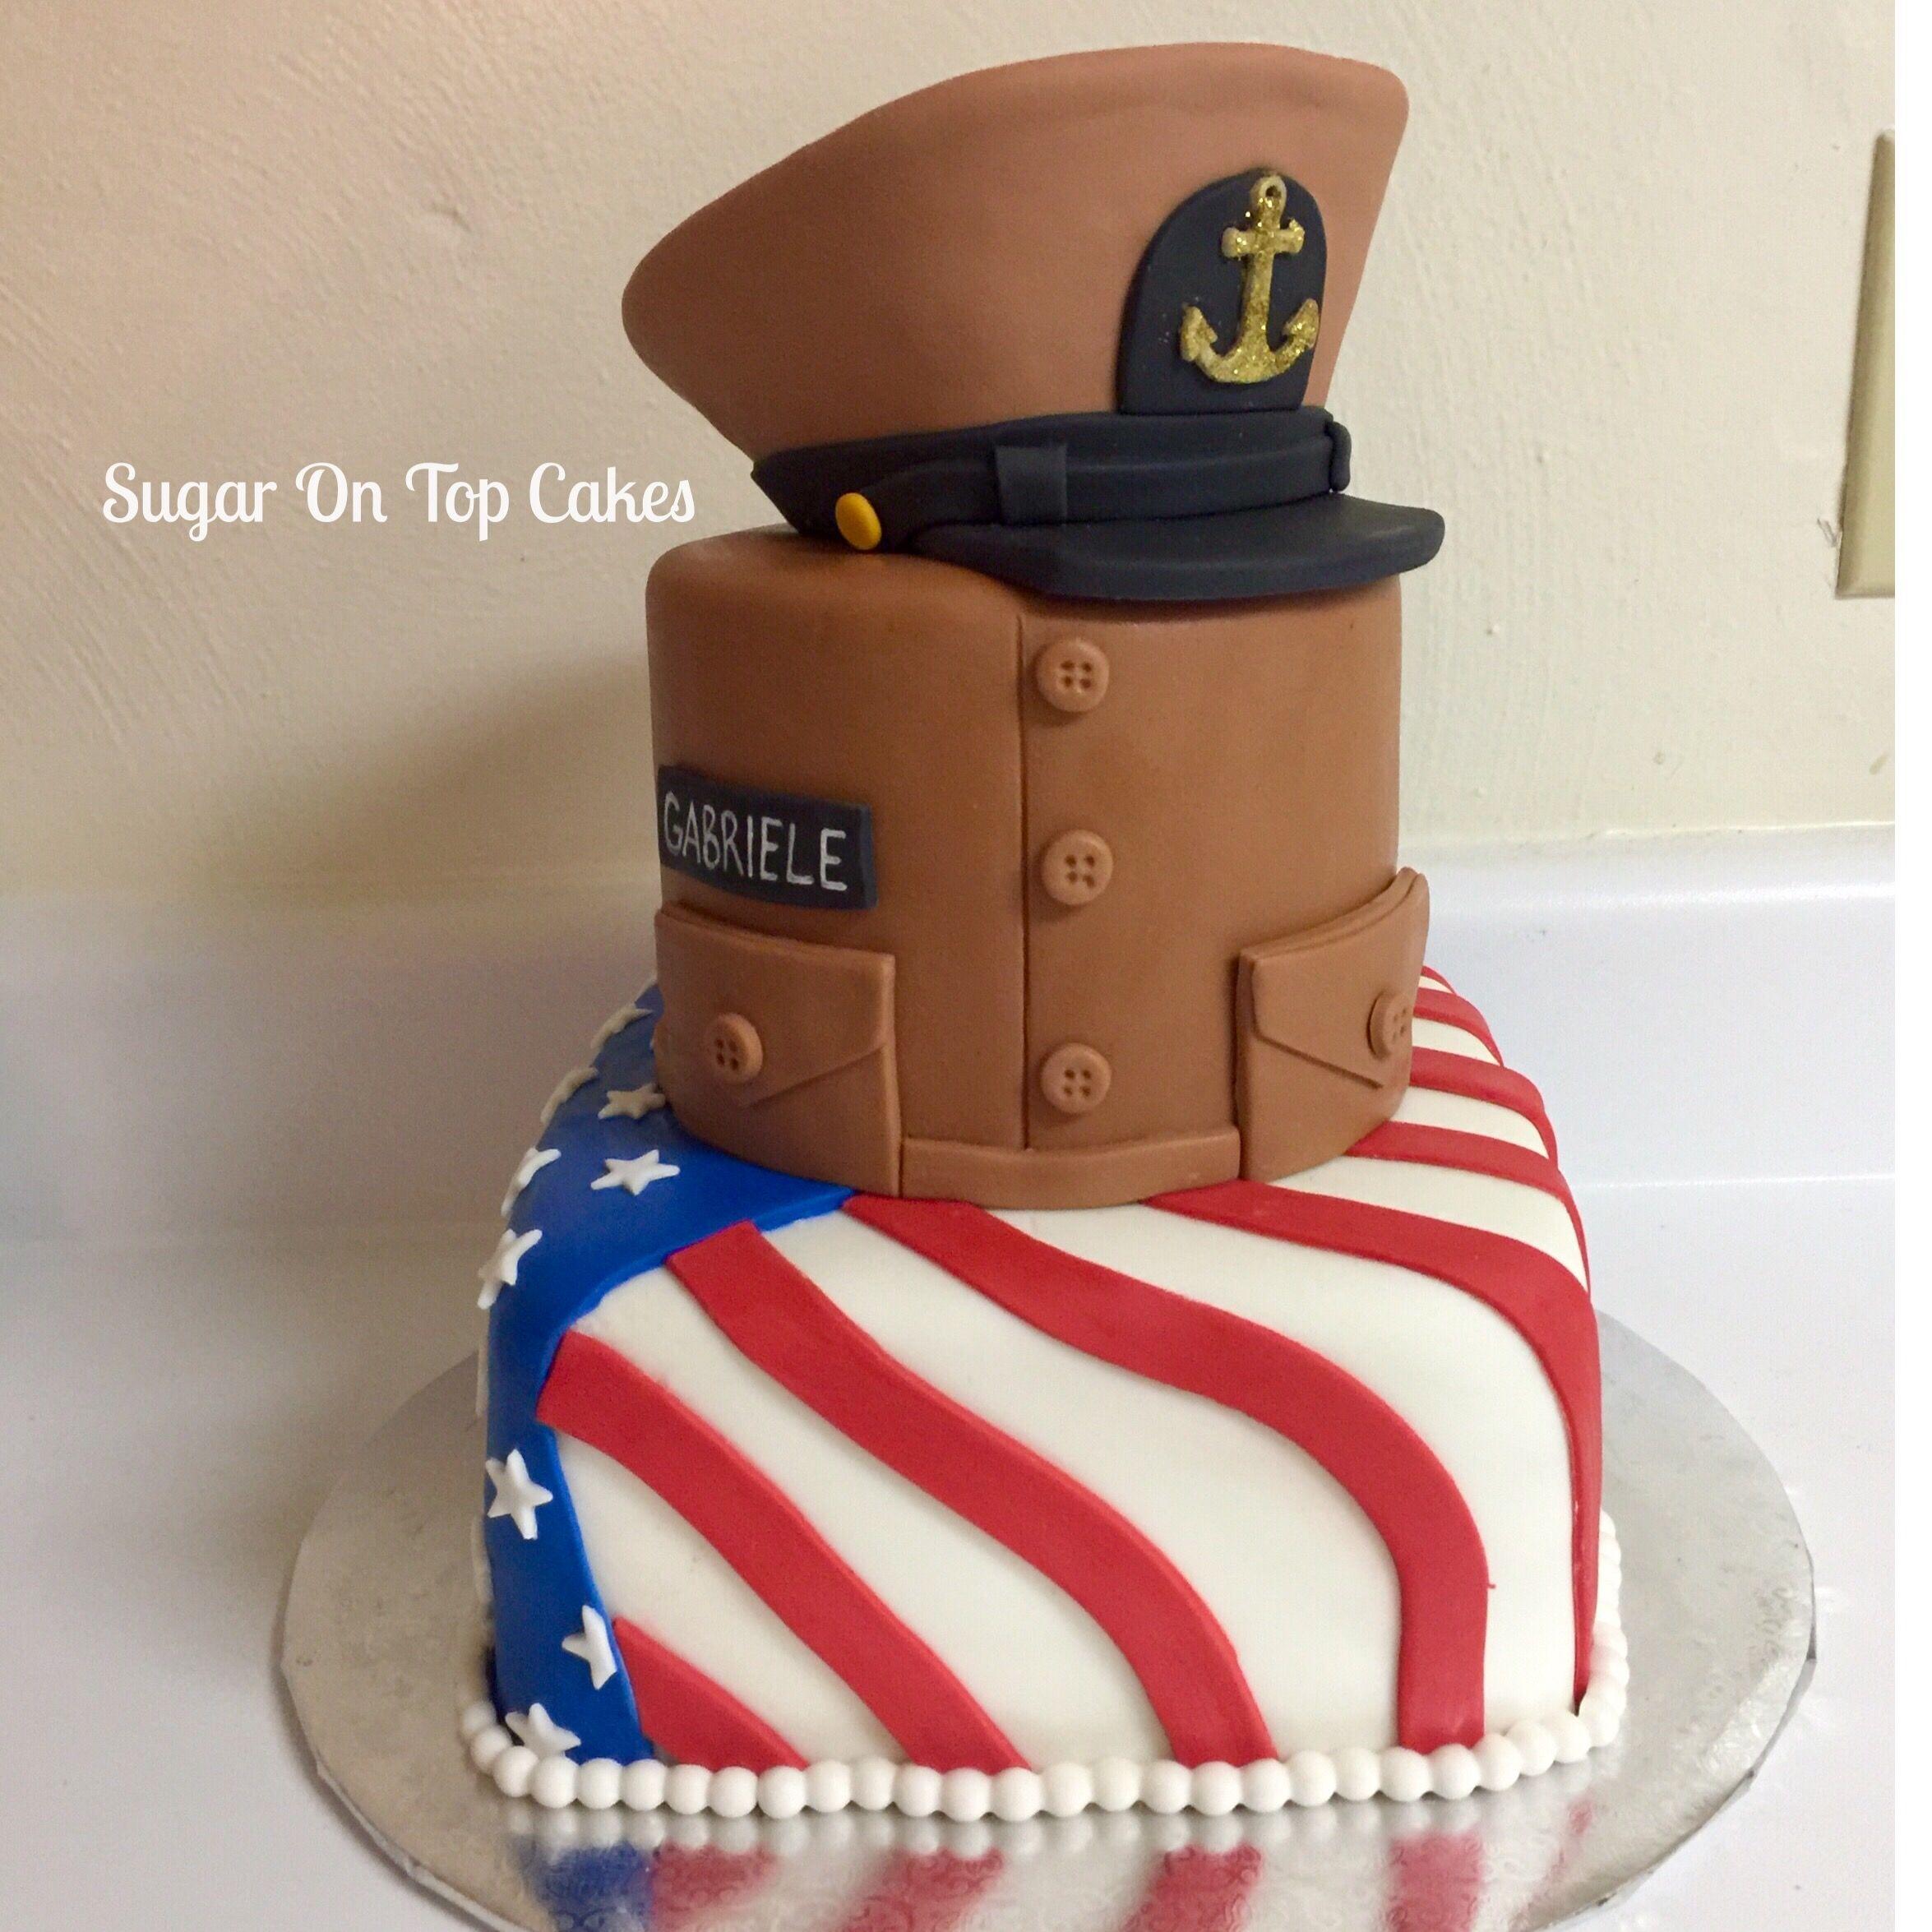 Fine Us Navy Chief Cake Facebook Com Sugarontopcakes Funny Birthday Cards Online Inifodamsfinfo